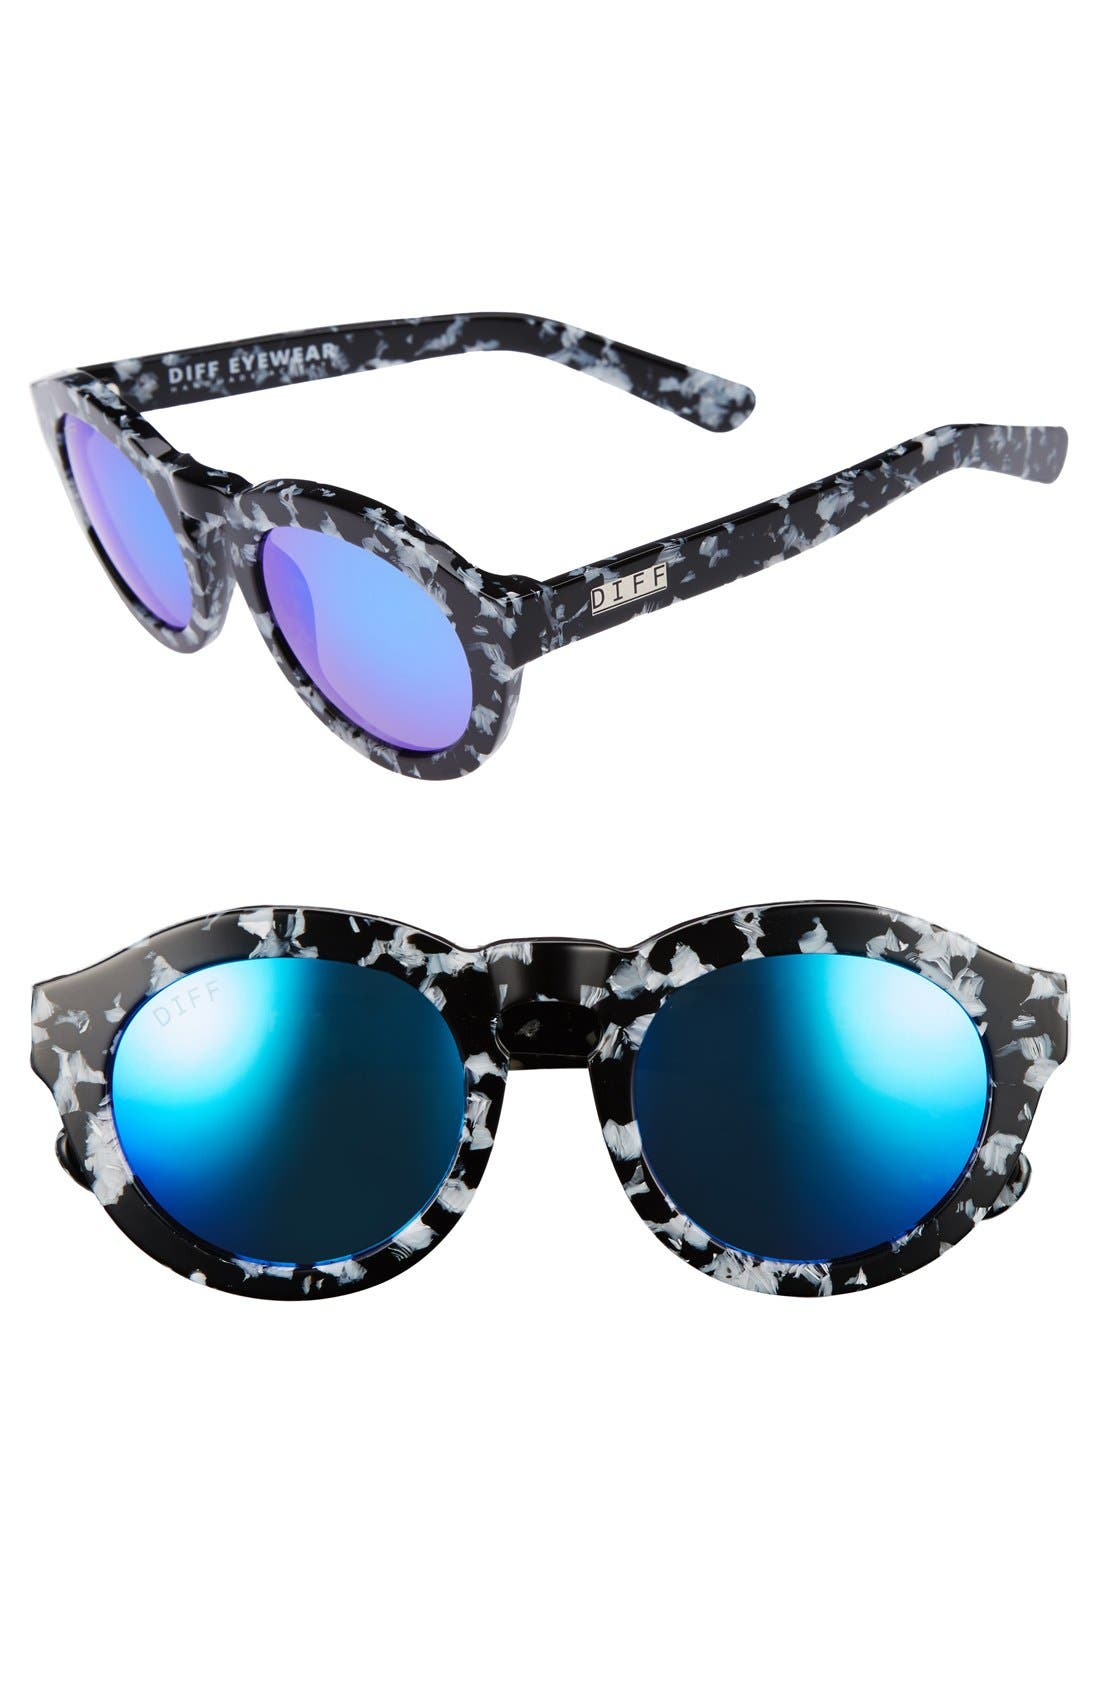 Dime 48mm Retro Sunglasses,                         Main,                         color, Black White/ Blue